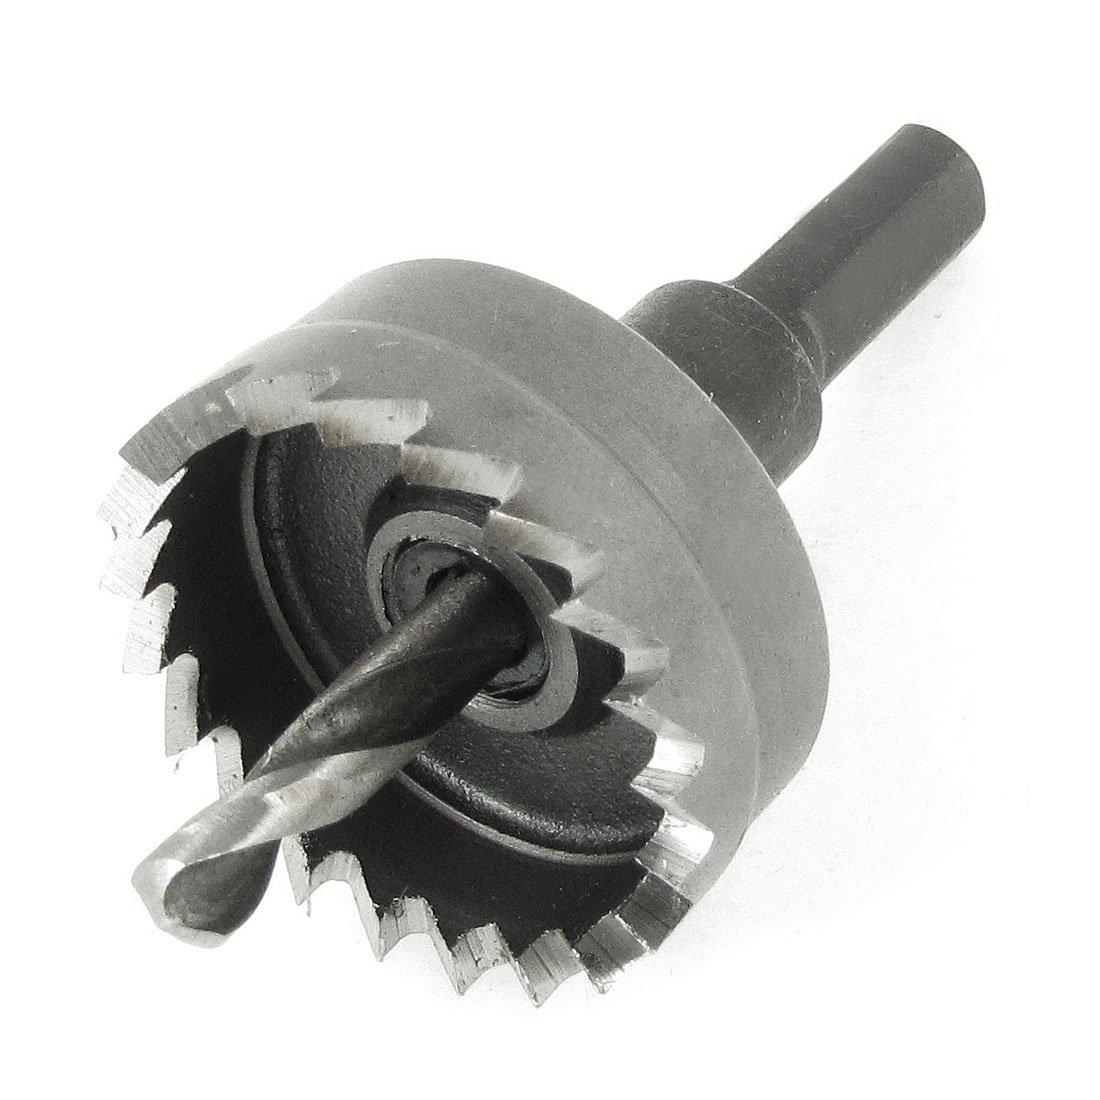 Hierro cortador redondo filo 5 mm Metal taladro sierra perforadora el/éctrica Bit 32 mm x 65 mm negro